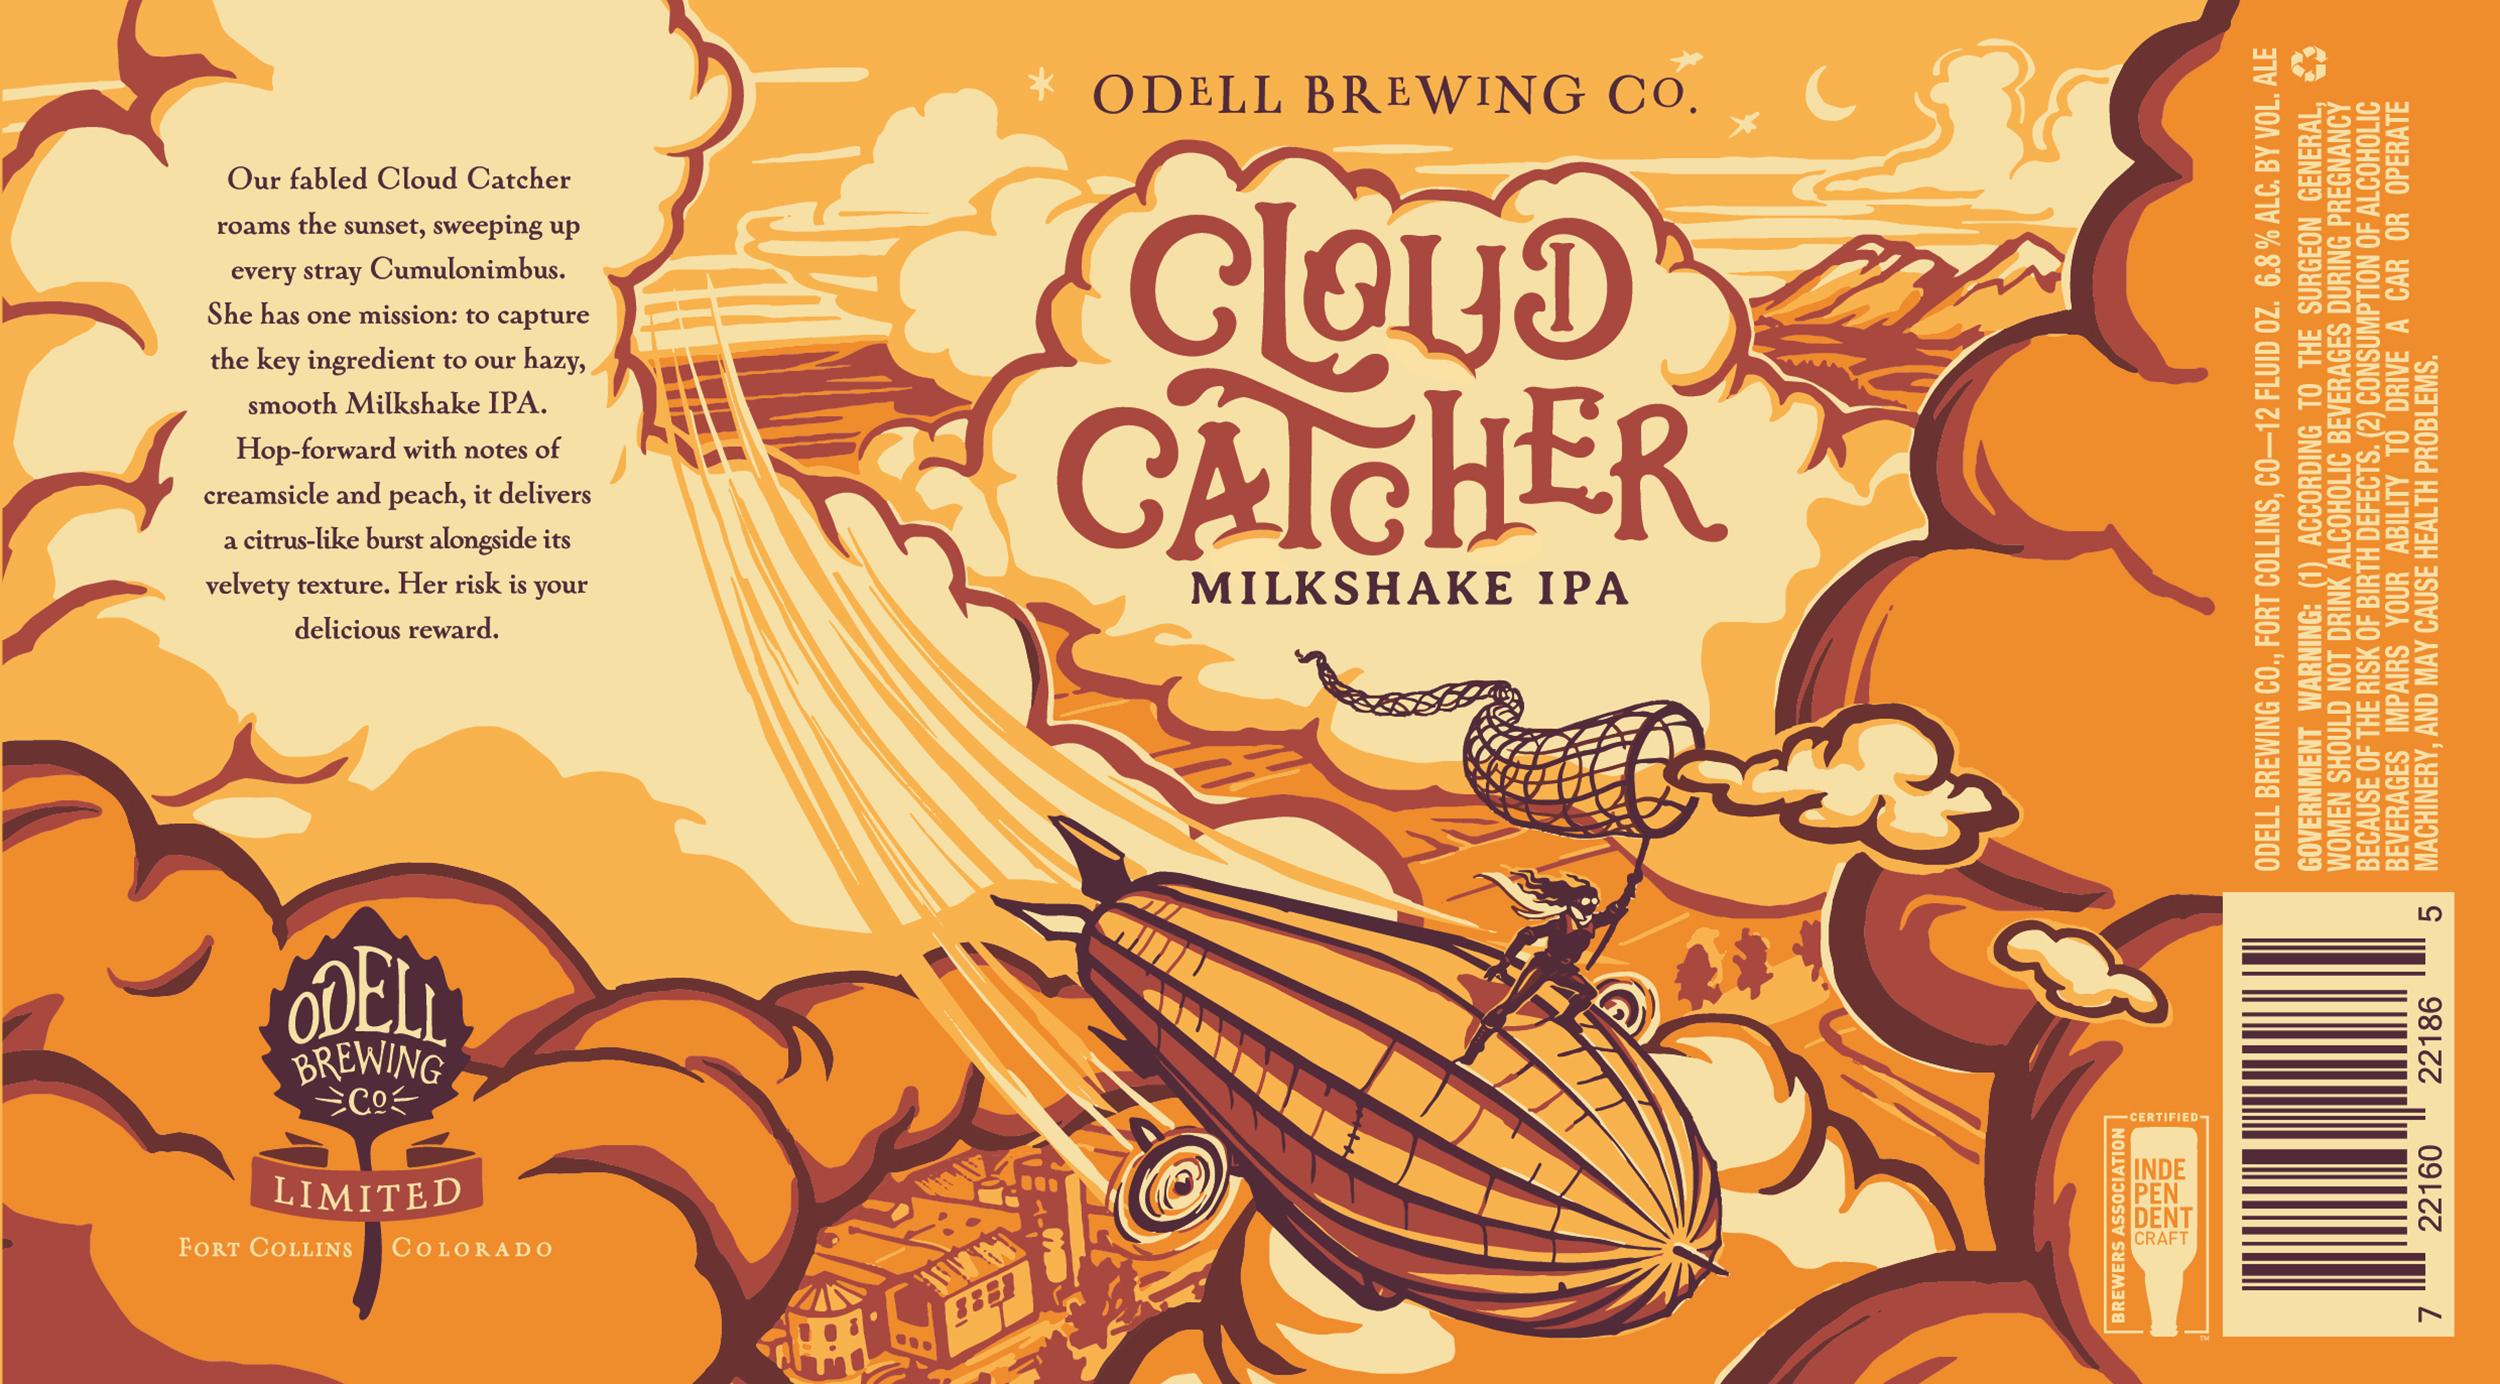 OBC580-094_FY18_CloudCatcher_Can_PROD-OL-01.jpg